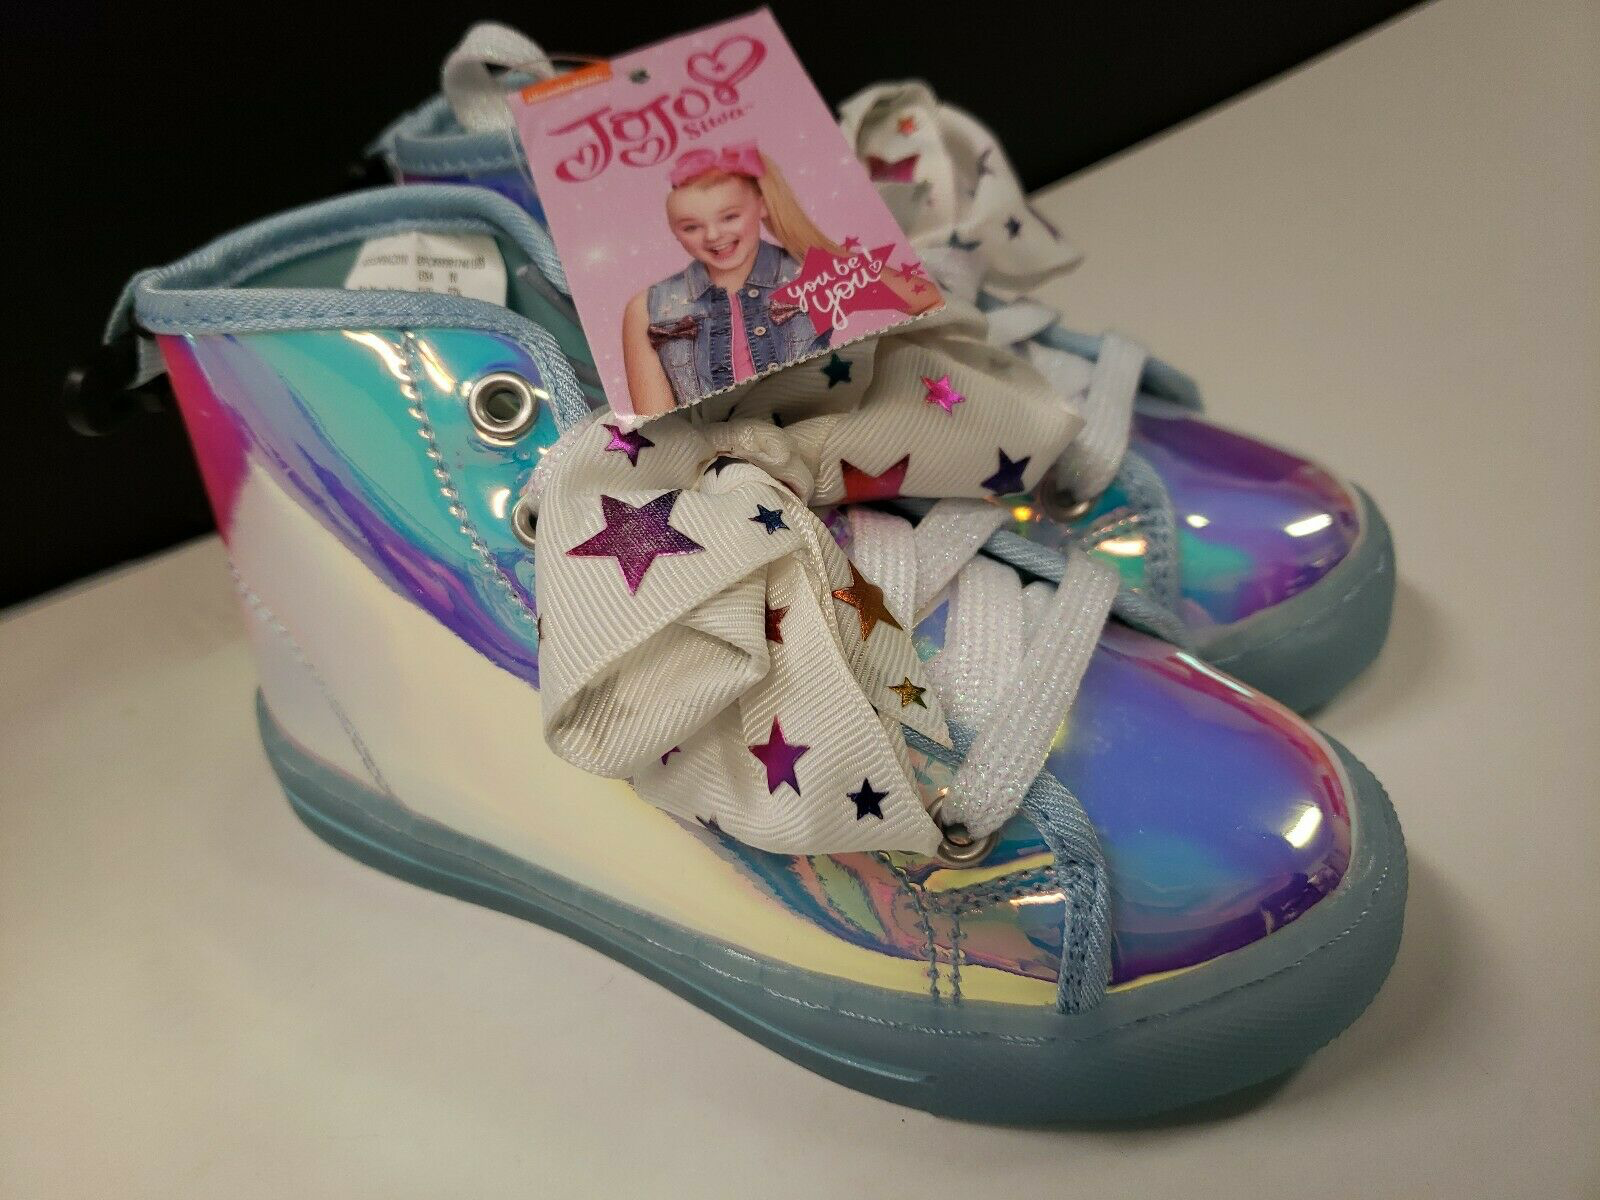 NWT Jojo Siwa Iridescent Bow Shoes High